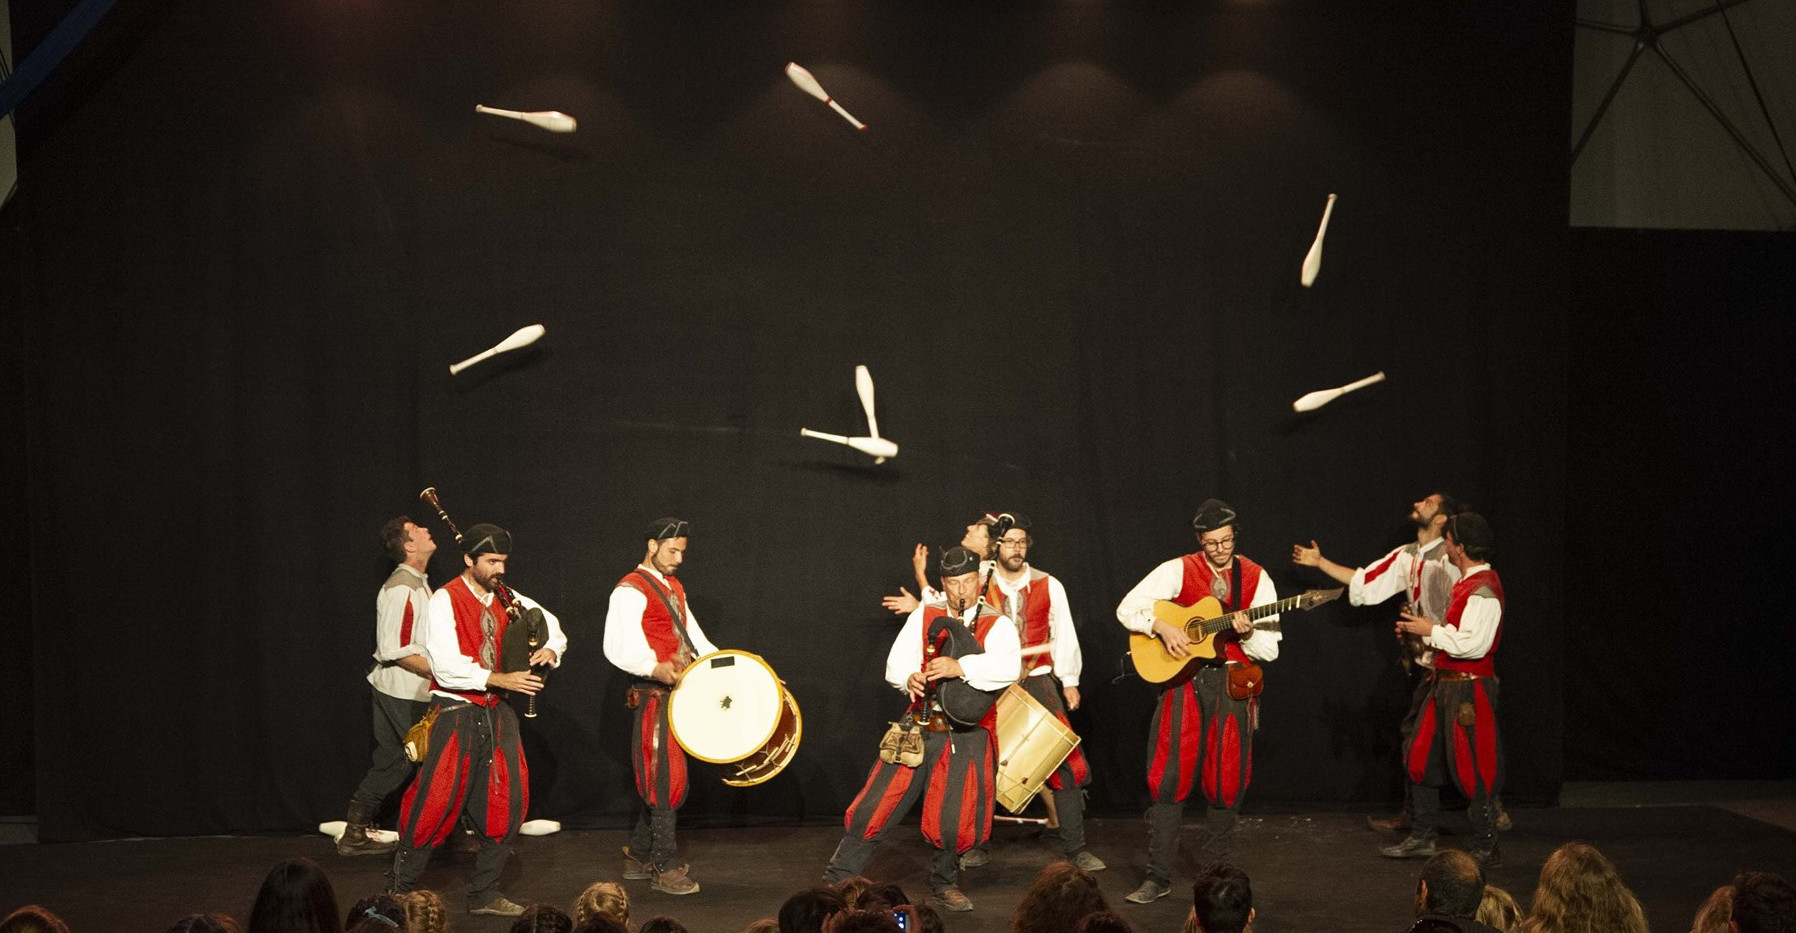 Al Cantara spectacle médiéval